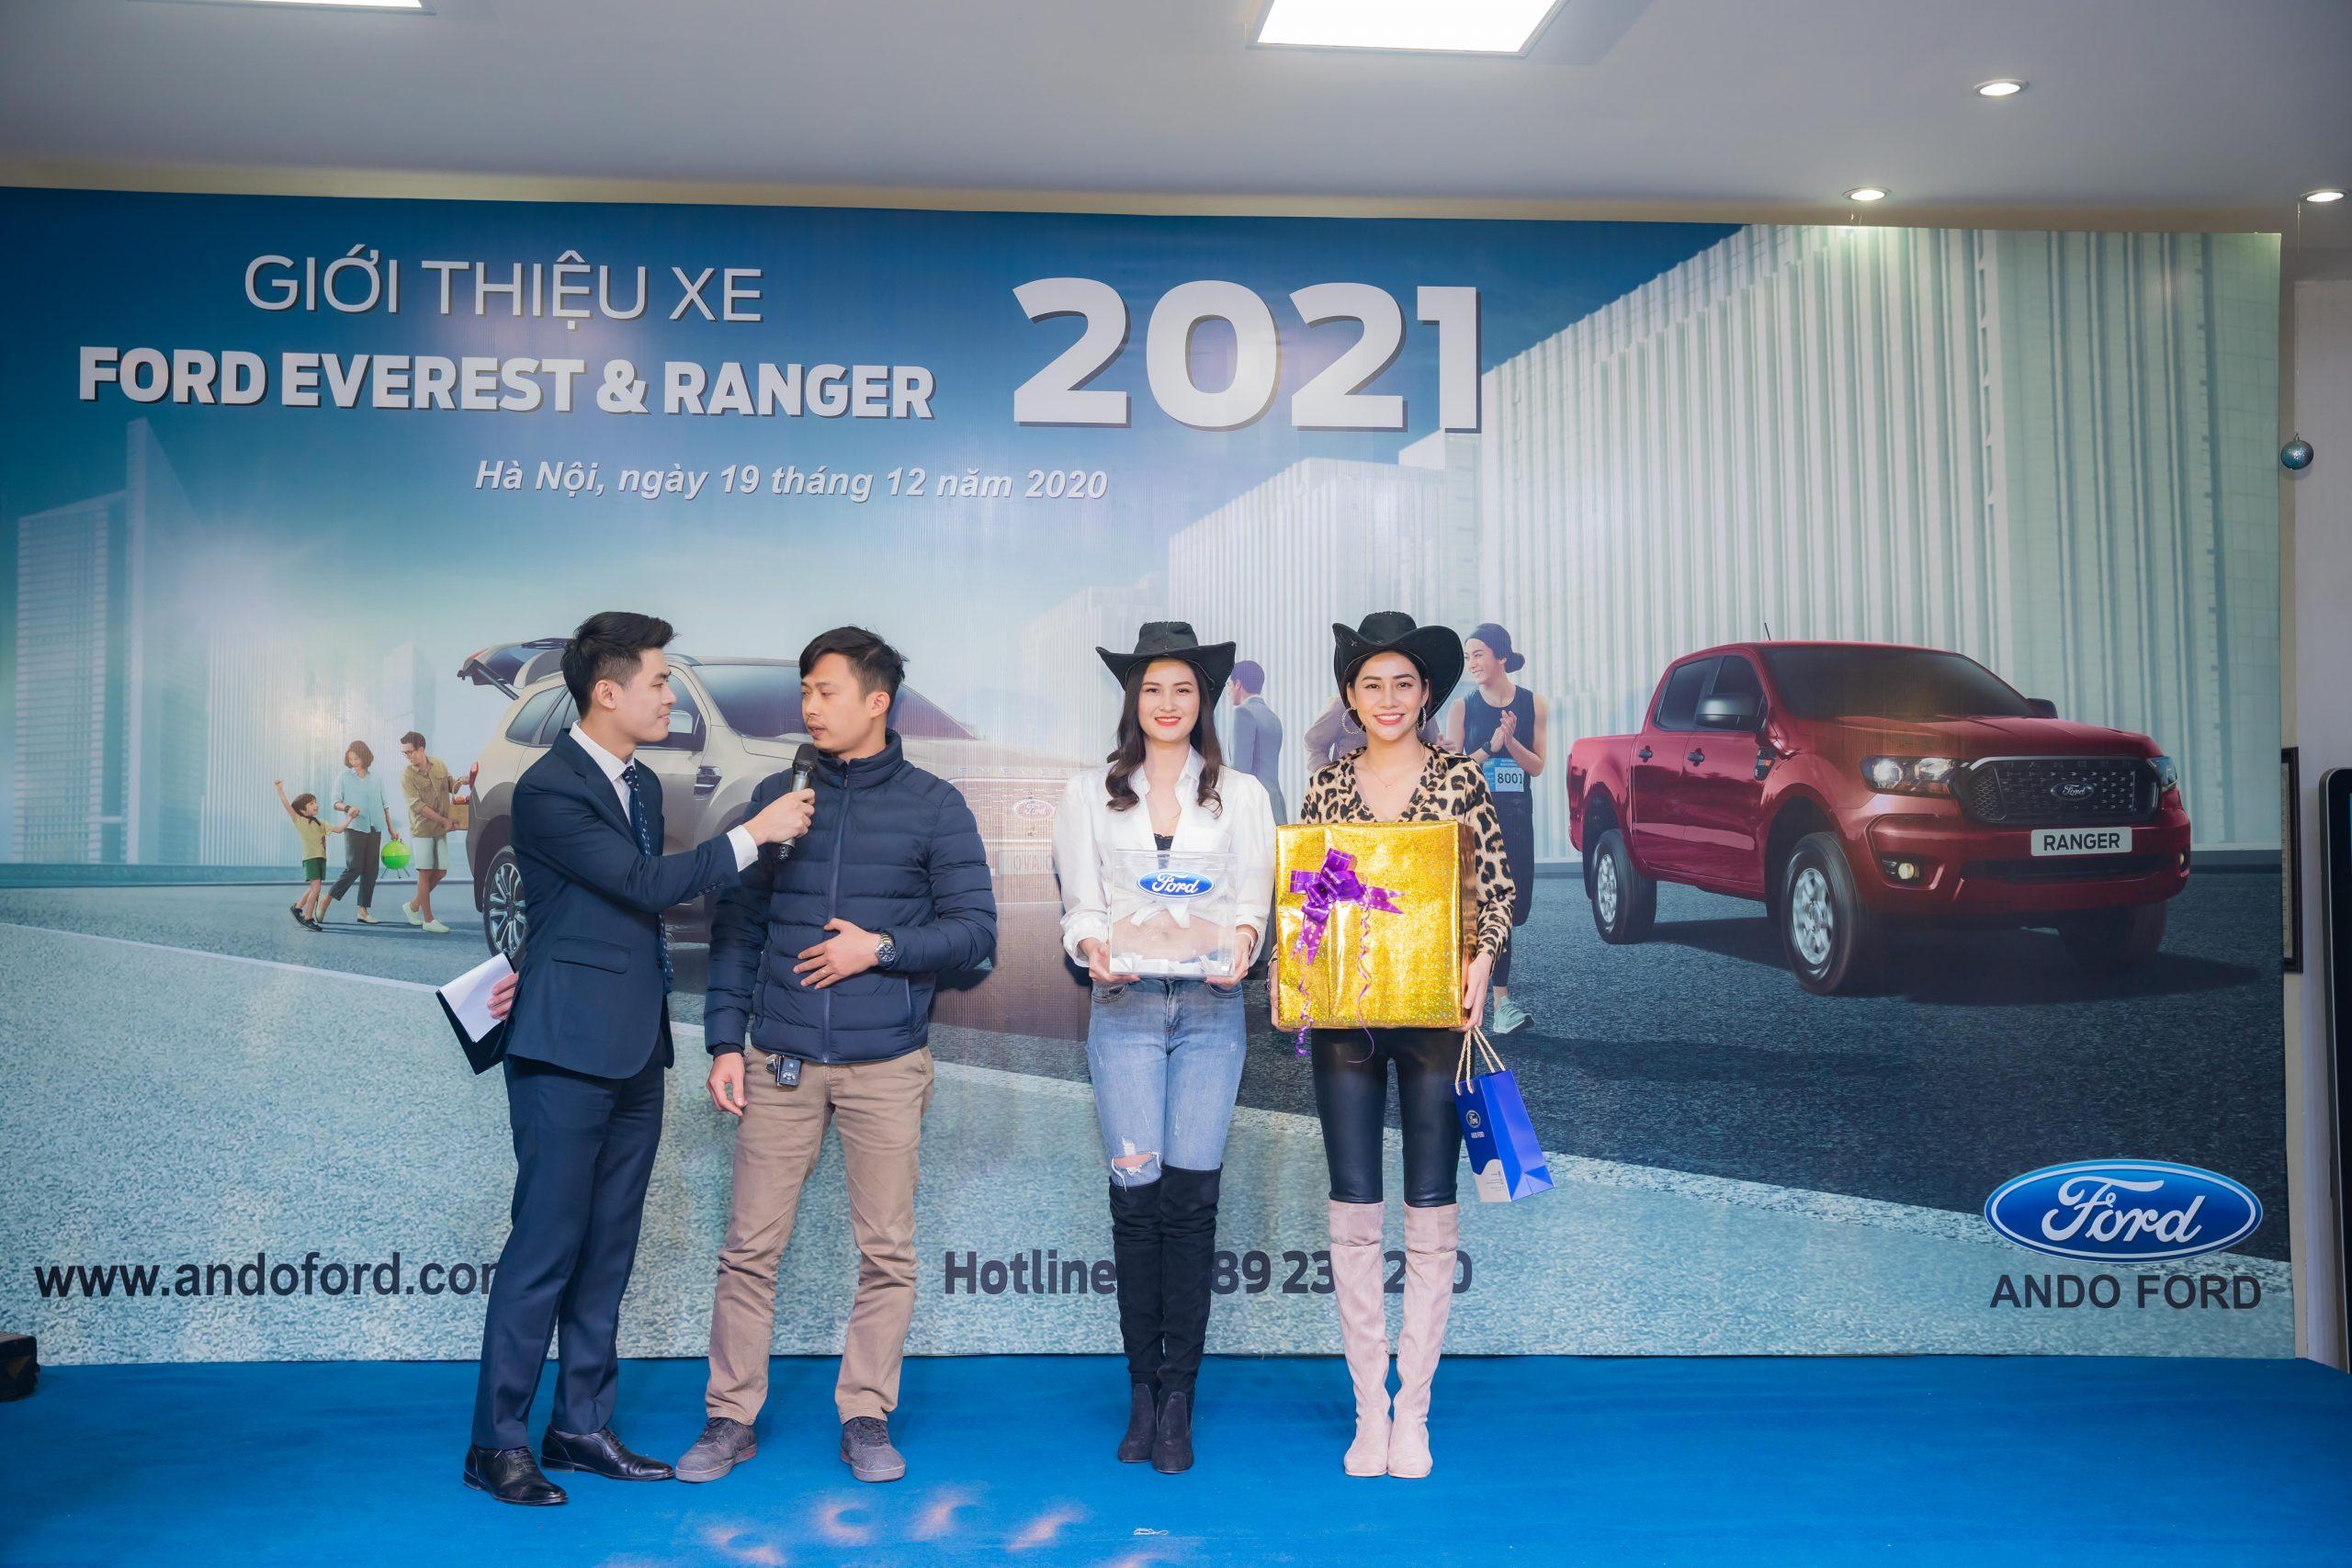 Sự kiện ra mắt cặp đôi Ford Everest & Ford Ranger Mới